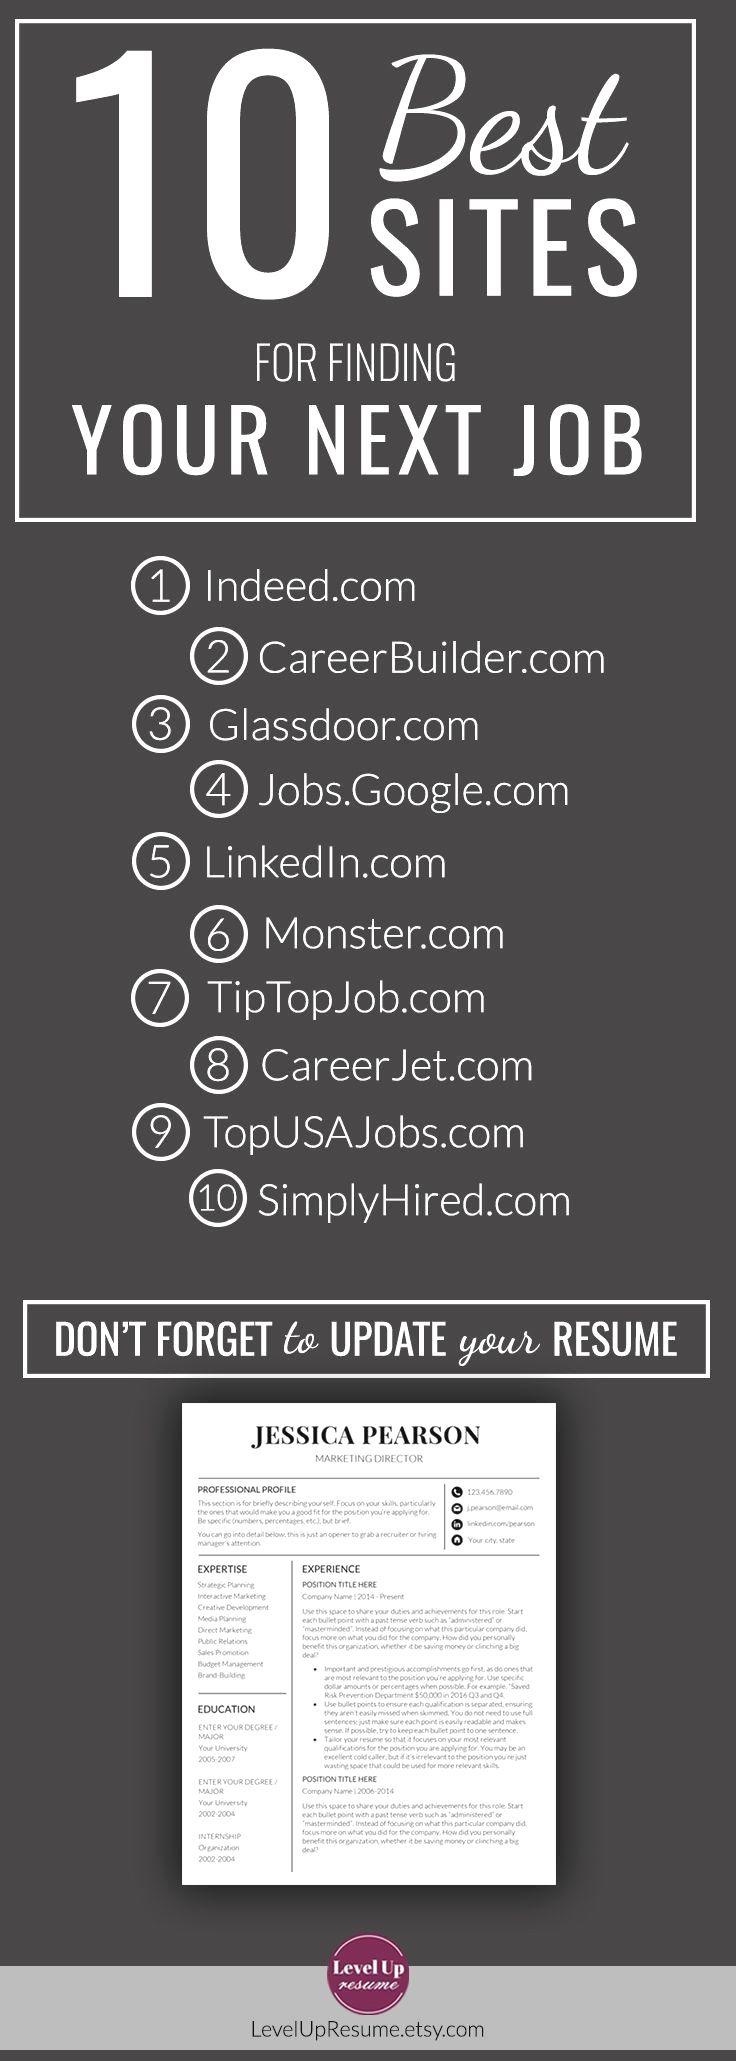 71 Amazing Resume Tumblr Resume Tips Resume Tips No Experience Basic Resume Examples